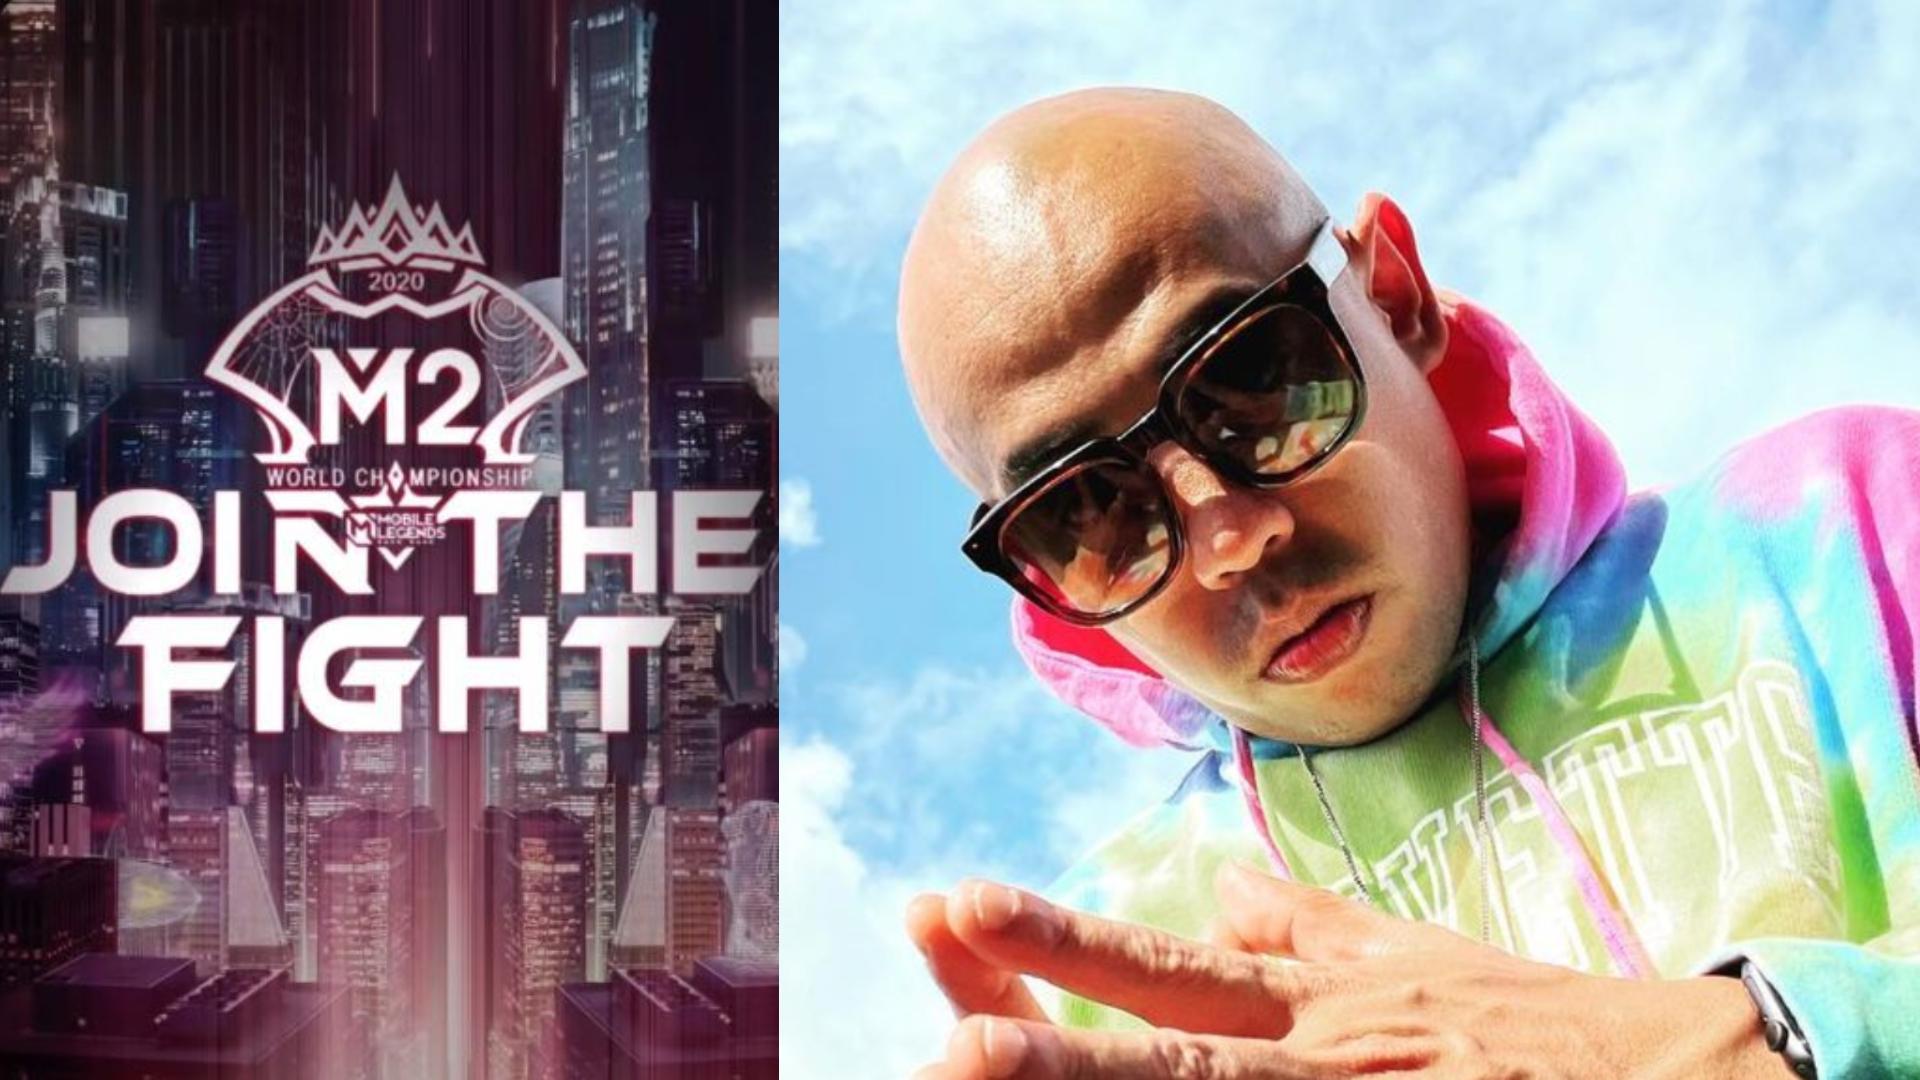 Lagu tema M2 Bahasa Melayu kolaborasi antara Moonton dan Joe Flizzow